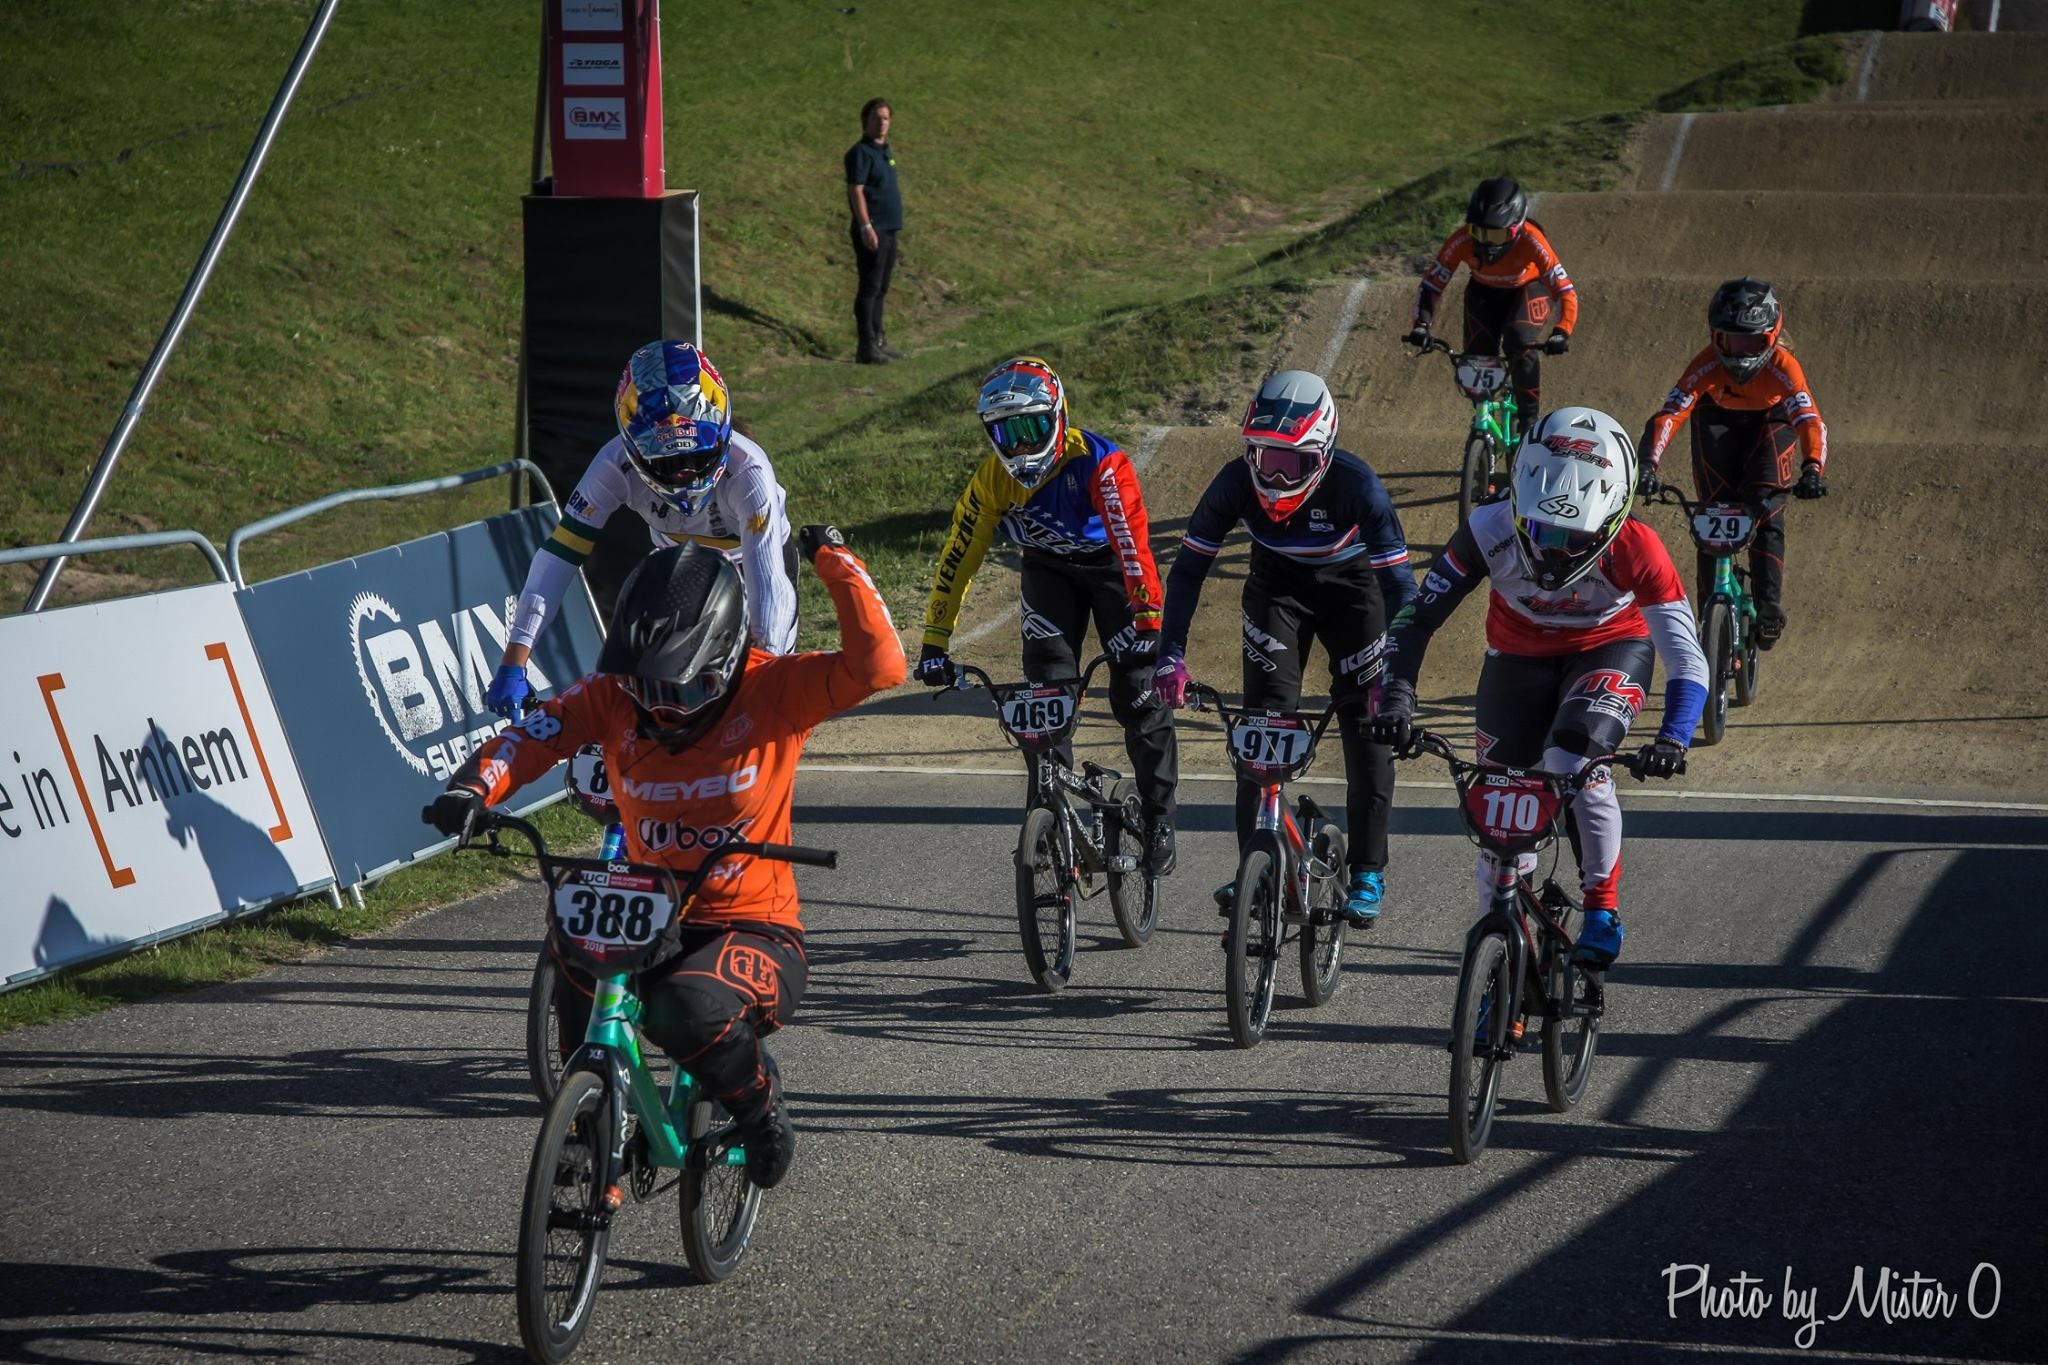 Judy juichend op de finish tijdens de wereldbeker in Papendal